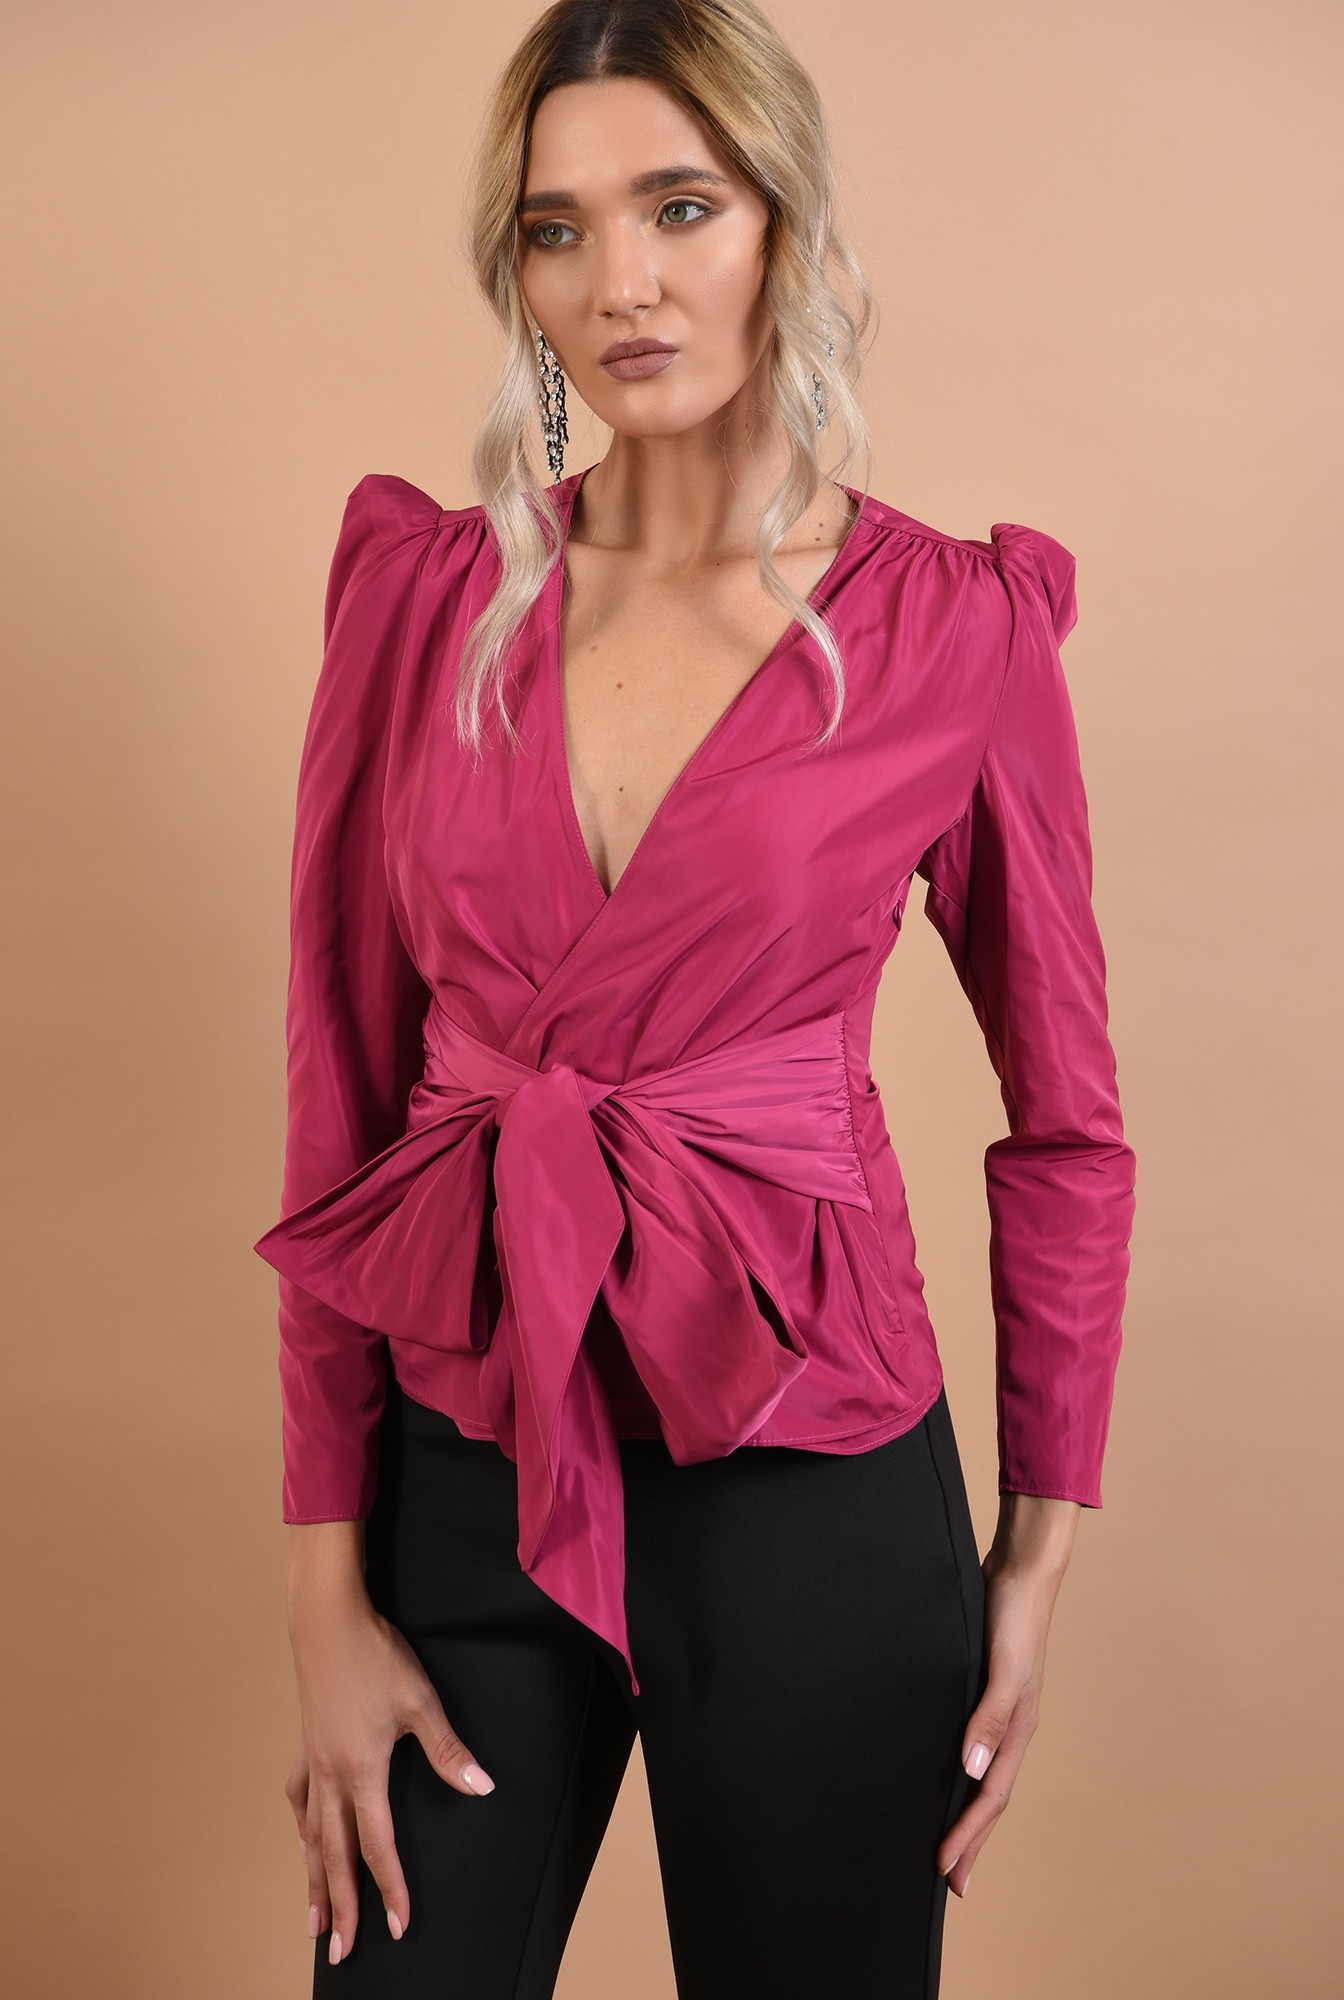 2 - bluza de seara, petrecuta, cu cordon, funda, umeri bufanti